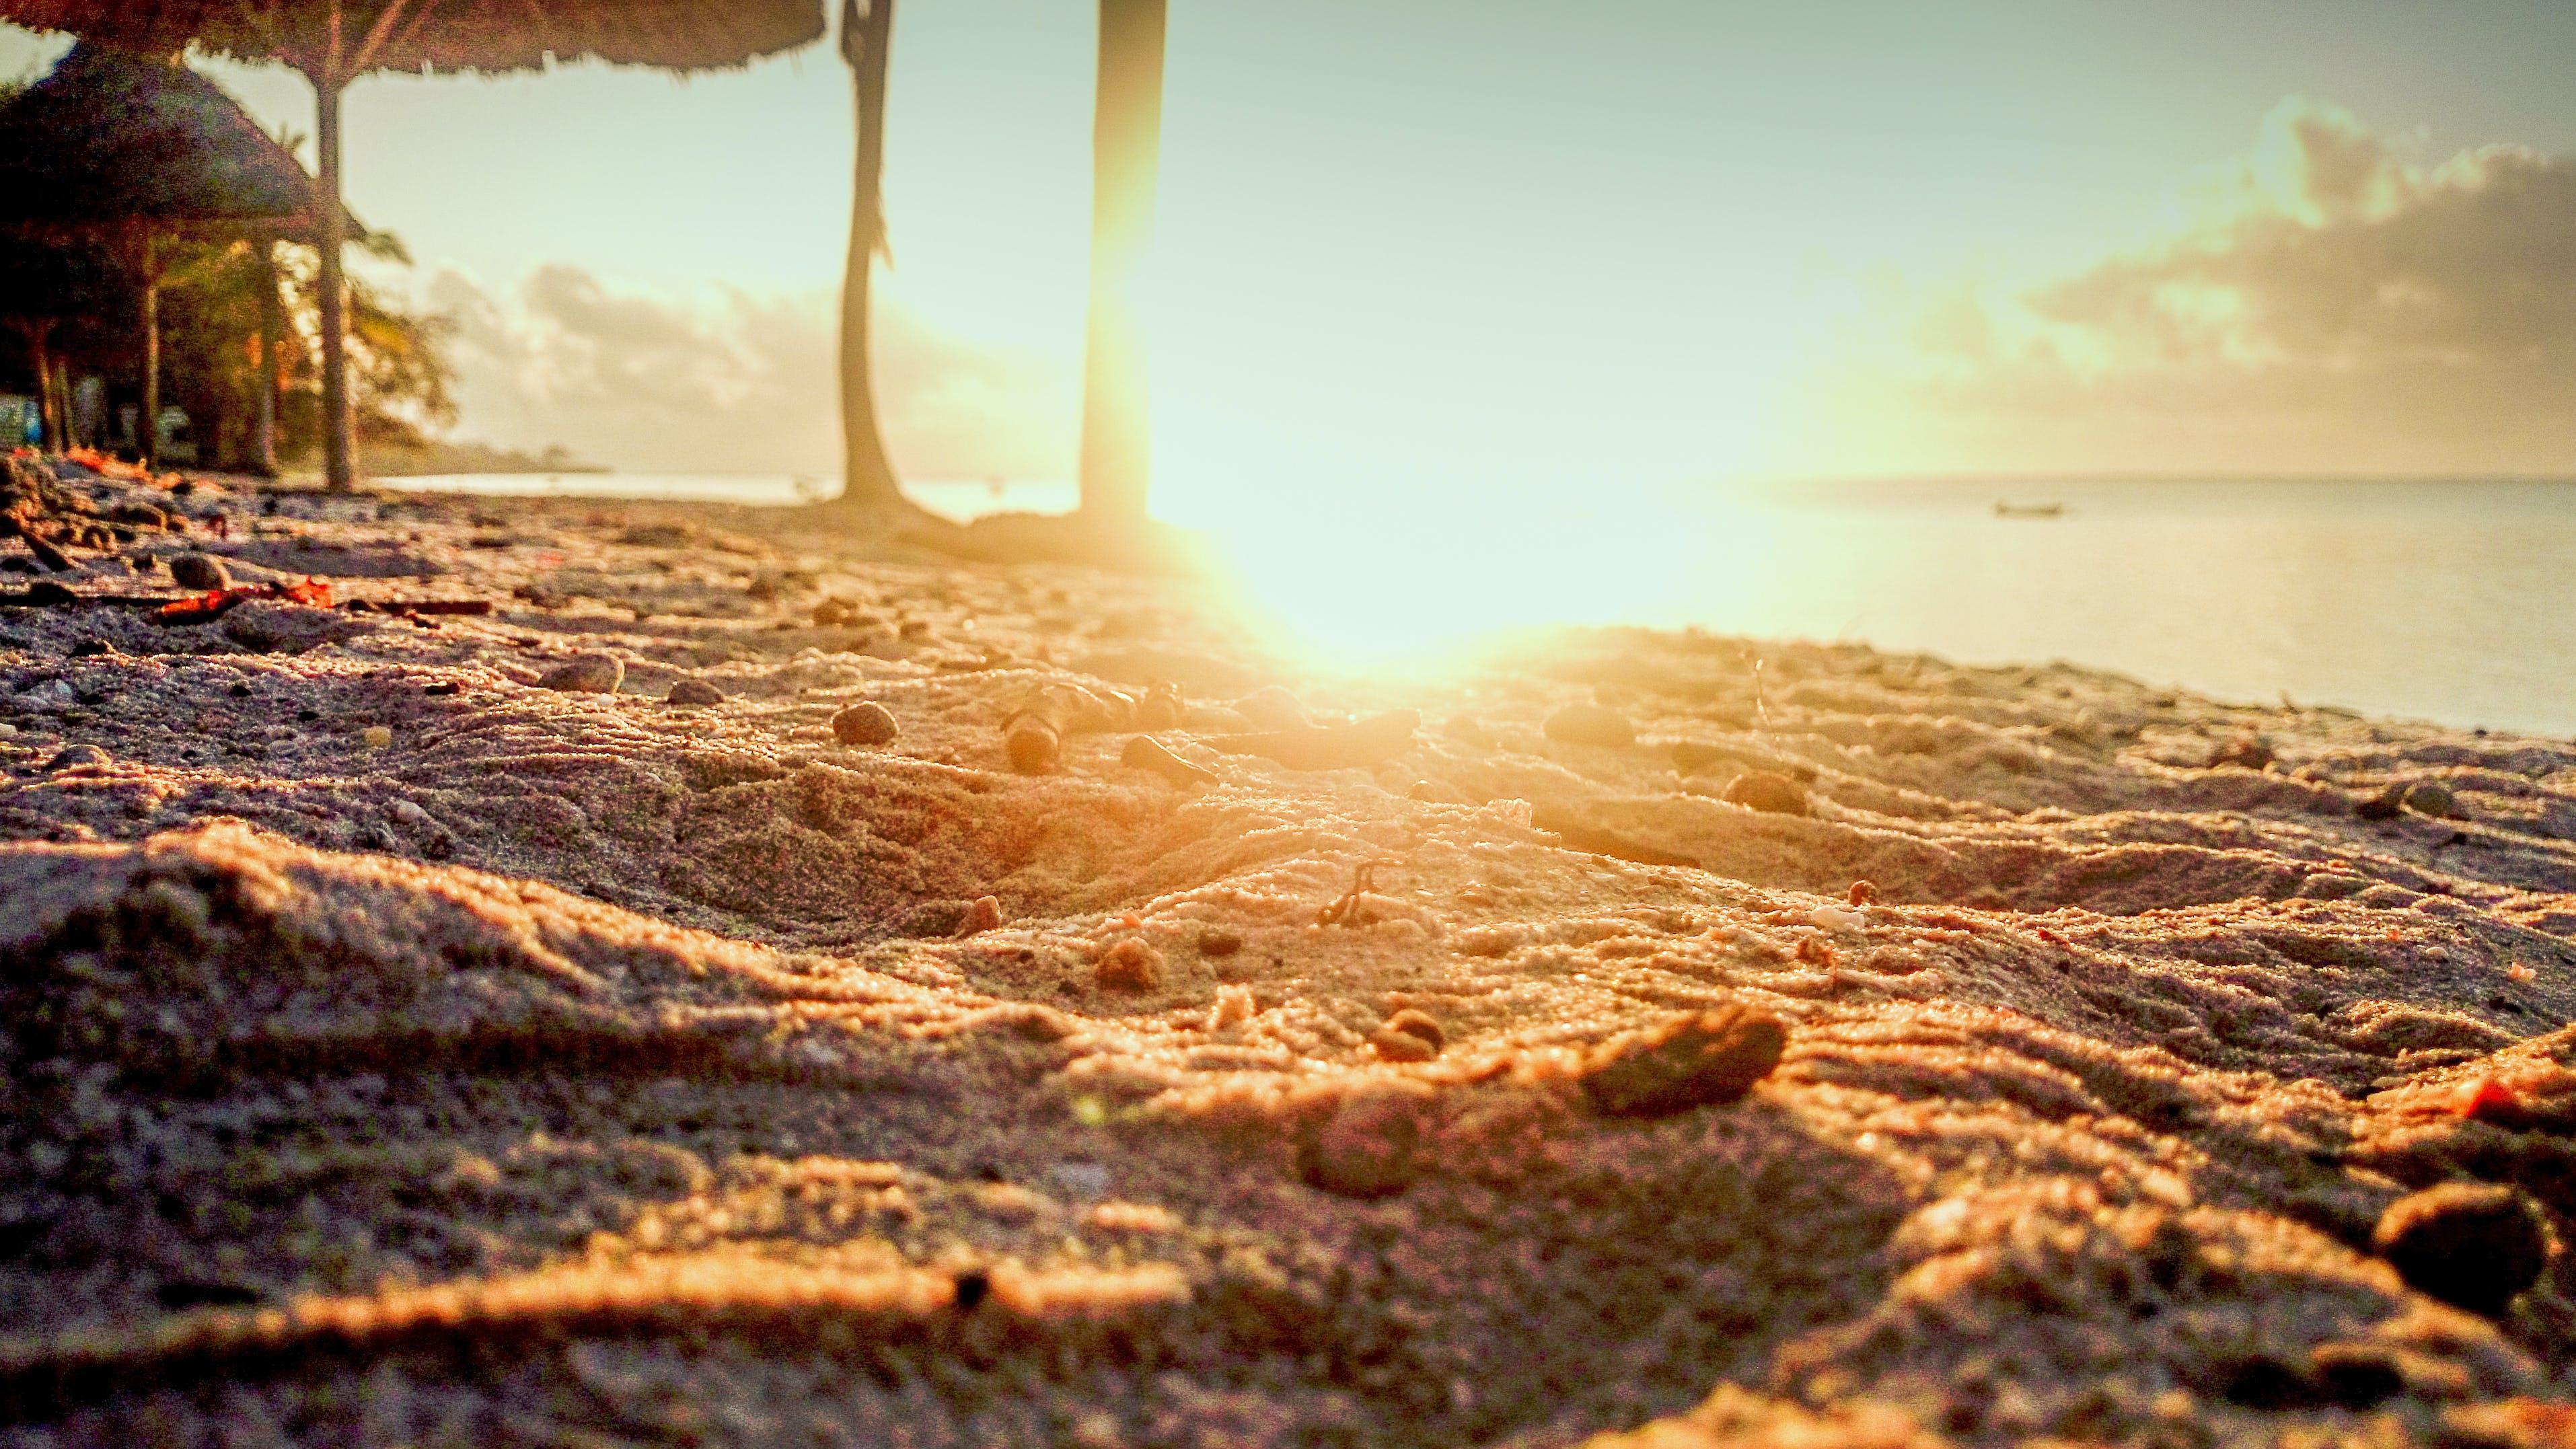 Shallow Focus Photo of Sand